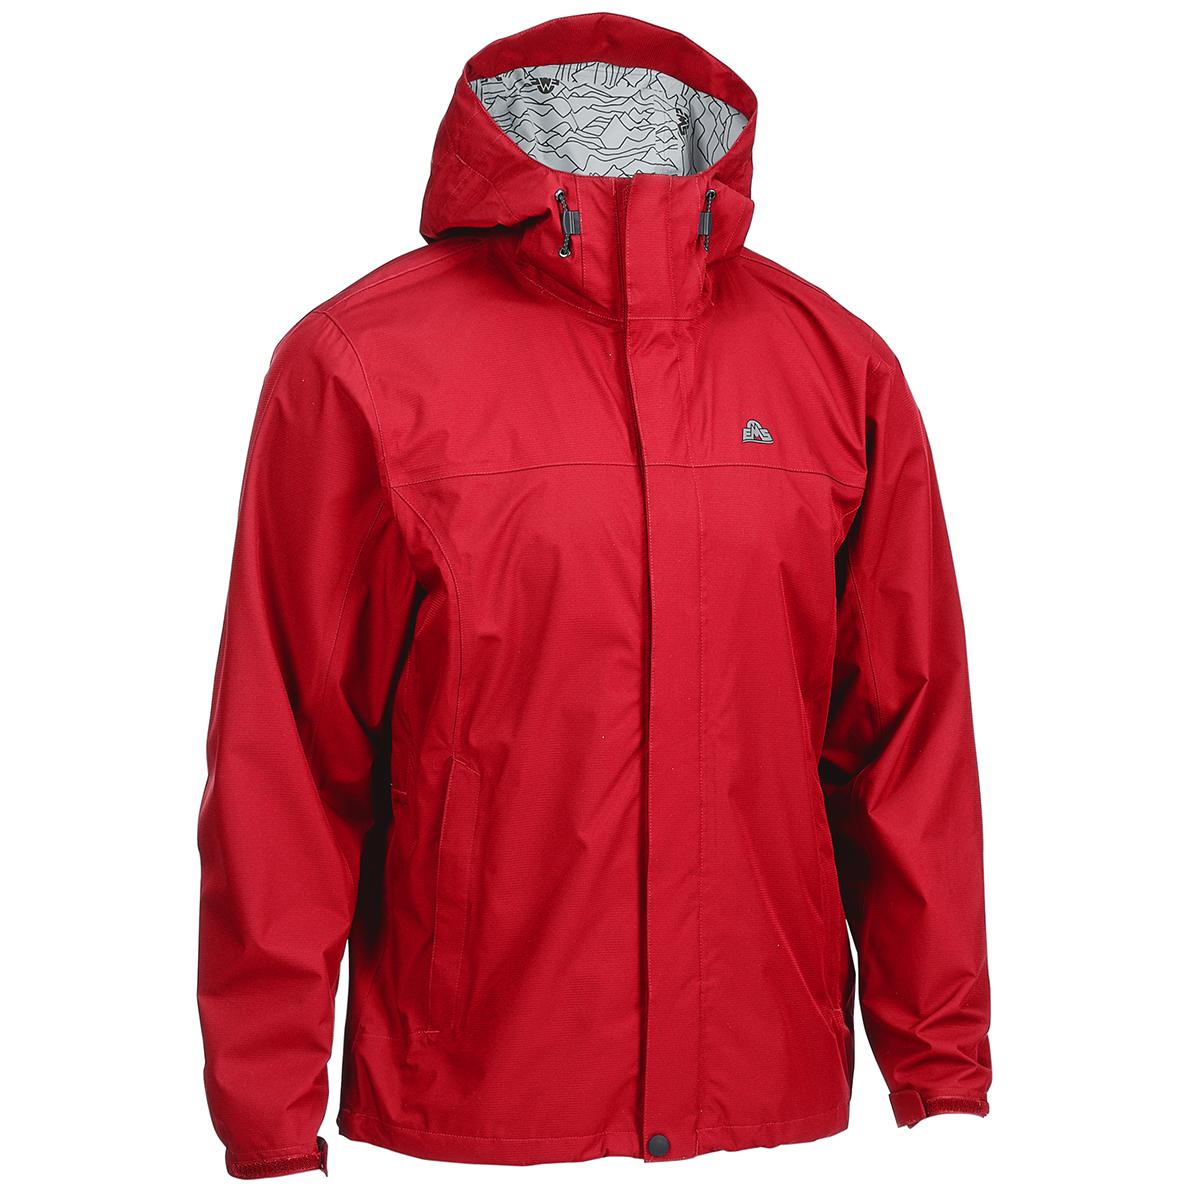 Ems Men's Thunderhead Peak Rain Jacket - Red, M